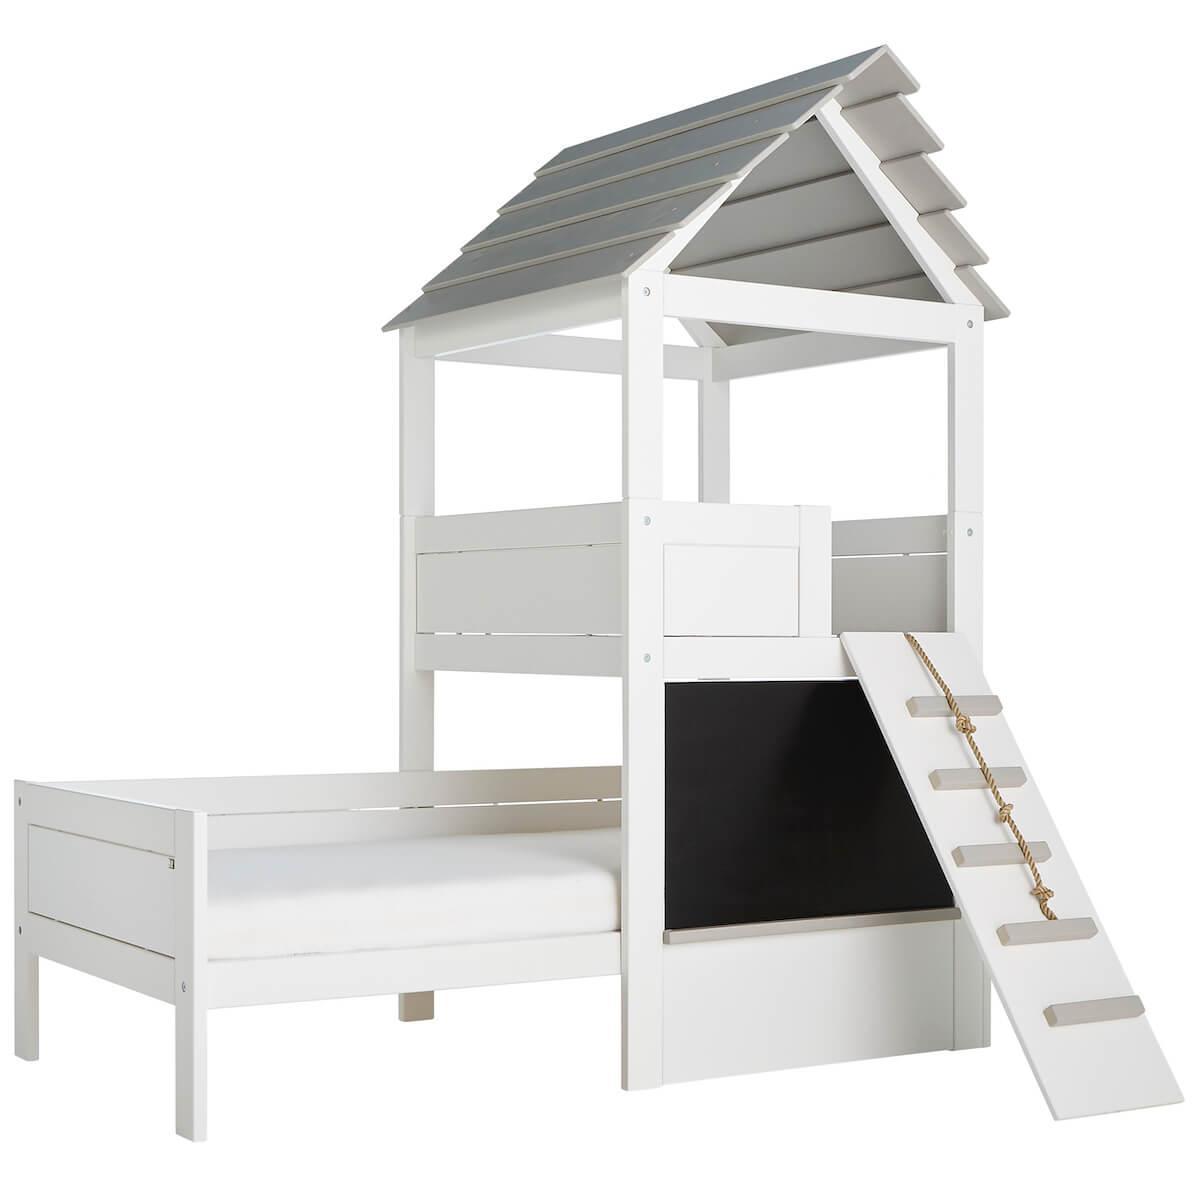 Lit cabane 90x200cm PLAY TOWER Lifetime blanc-grey wash